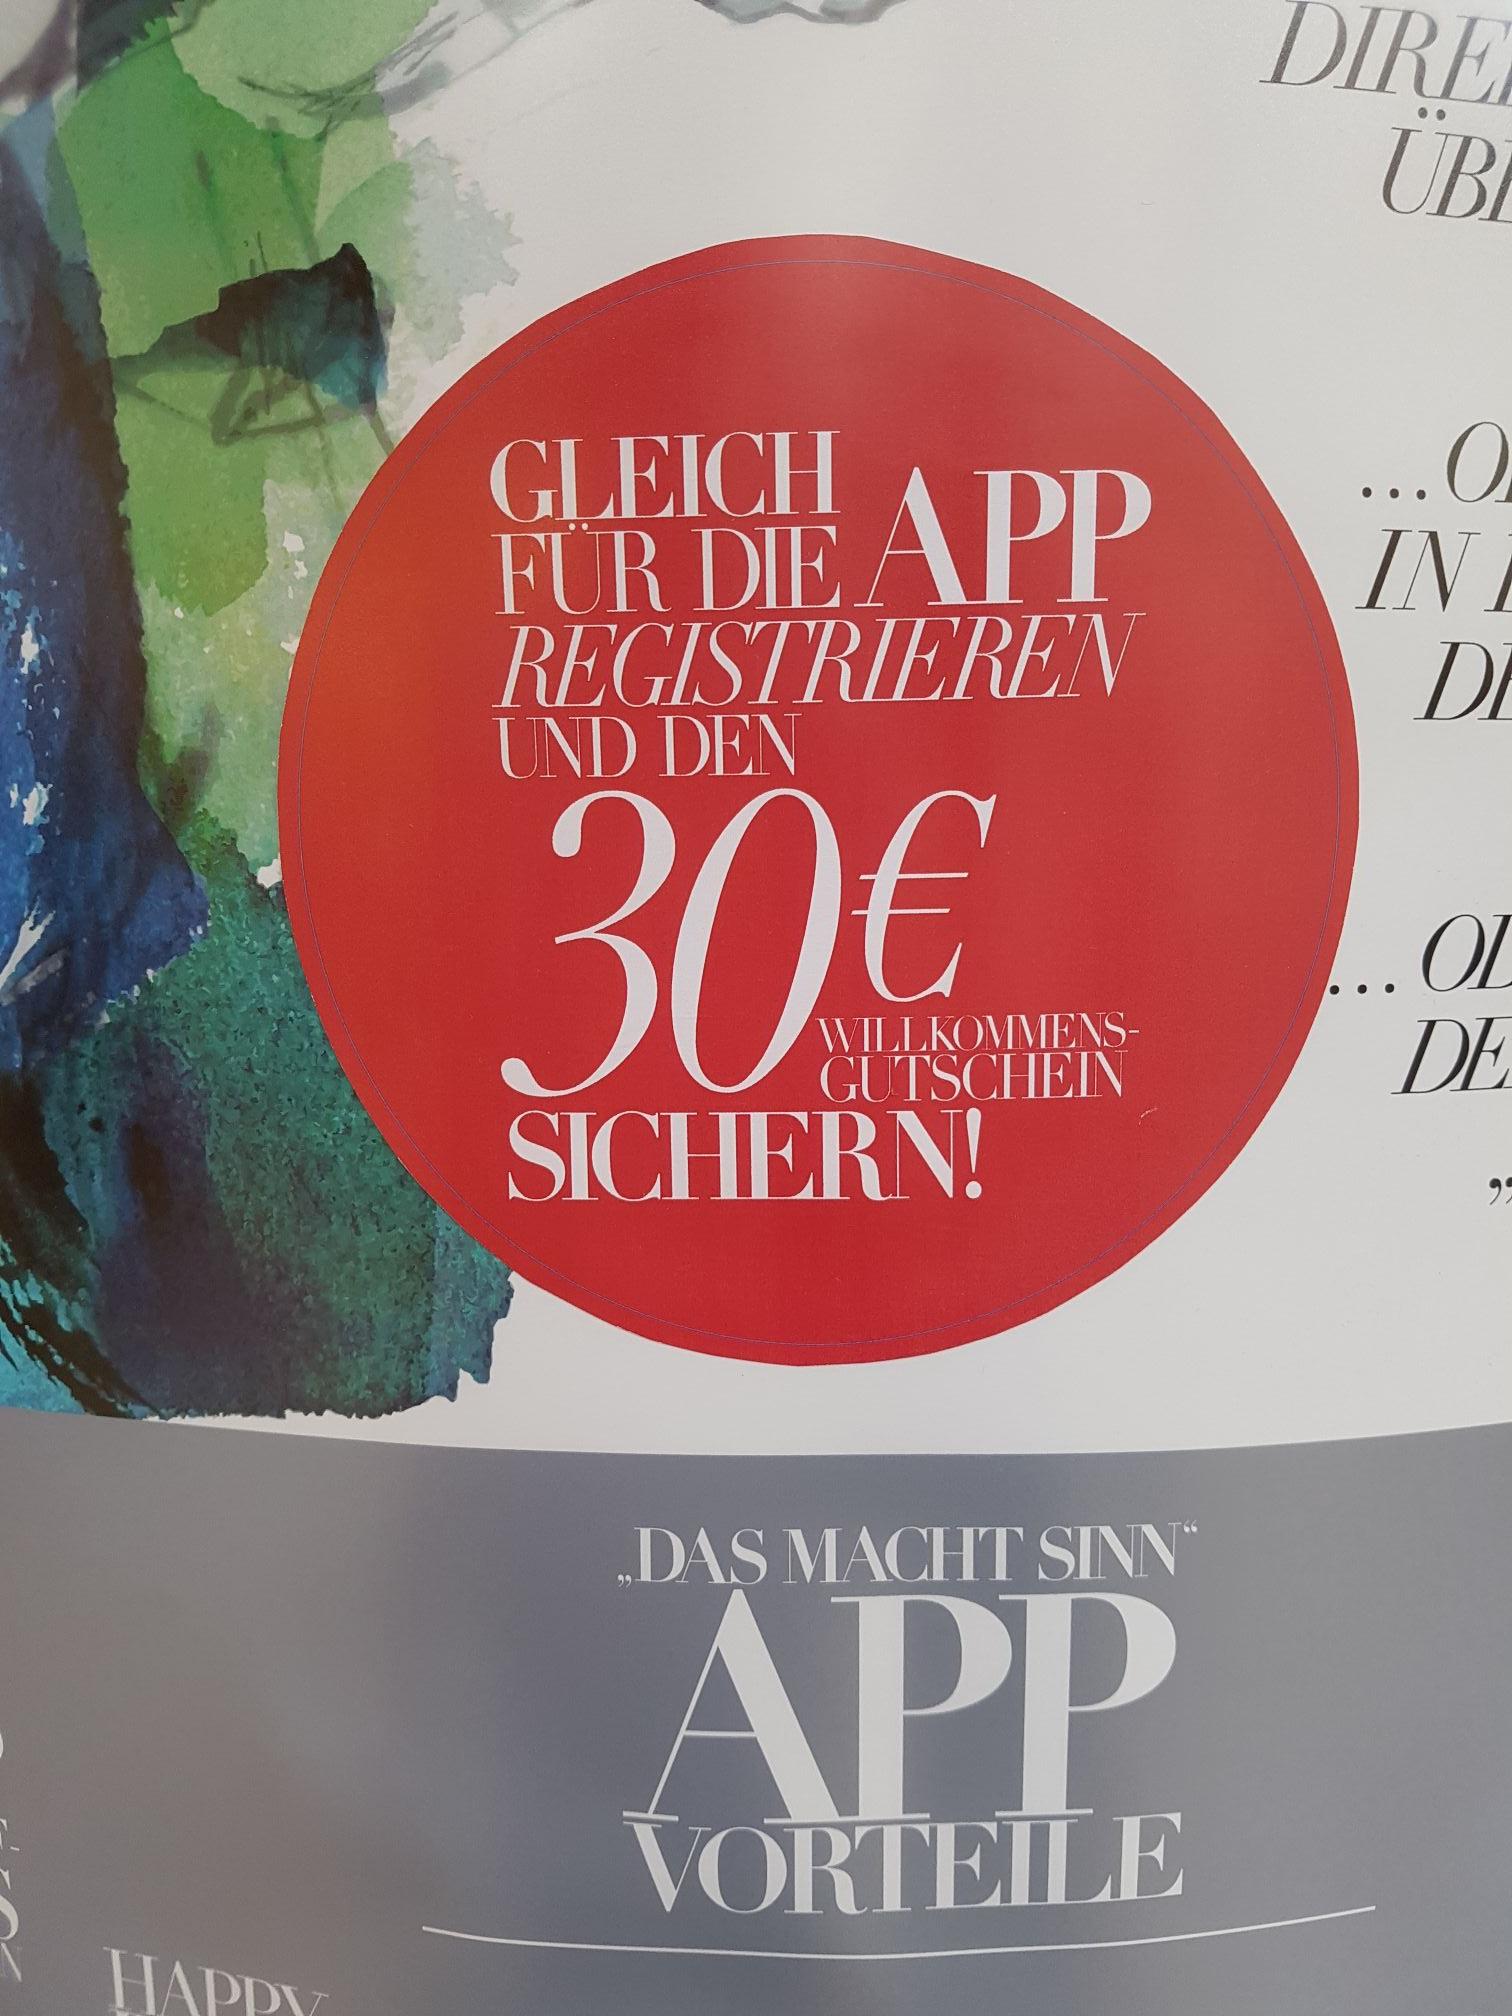 Sinnleffers 30€ Abzug ab 100€ durch Appregistrierung